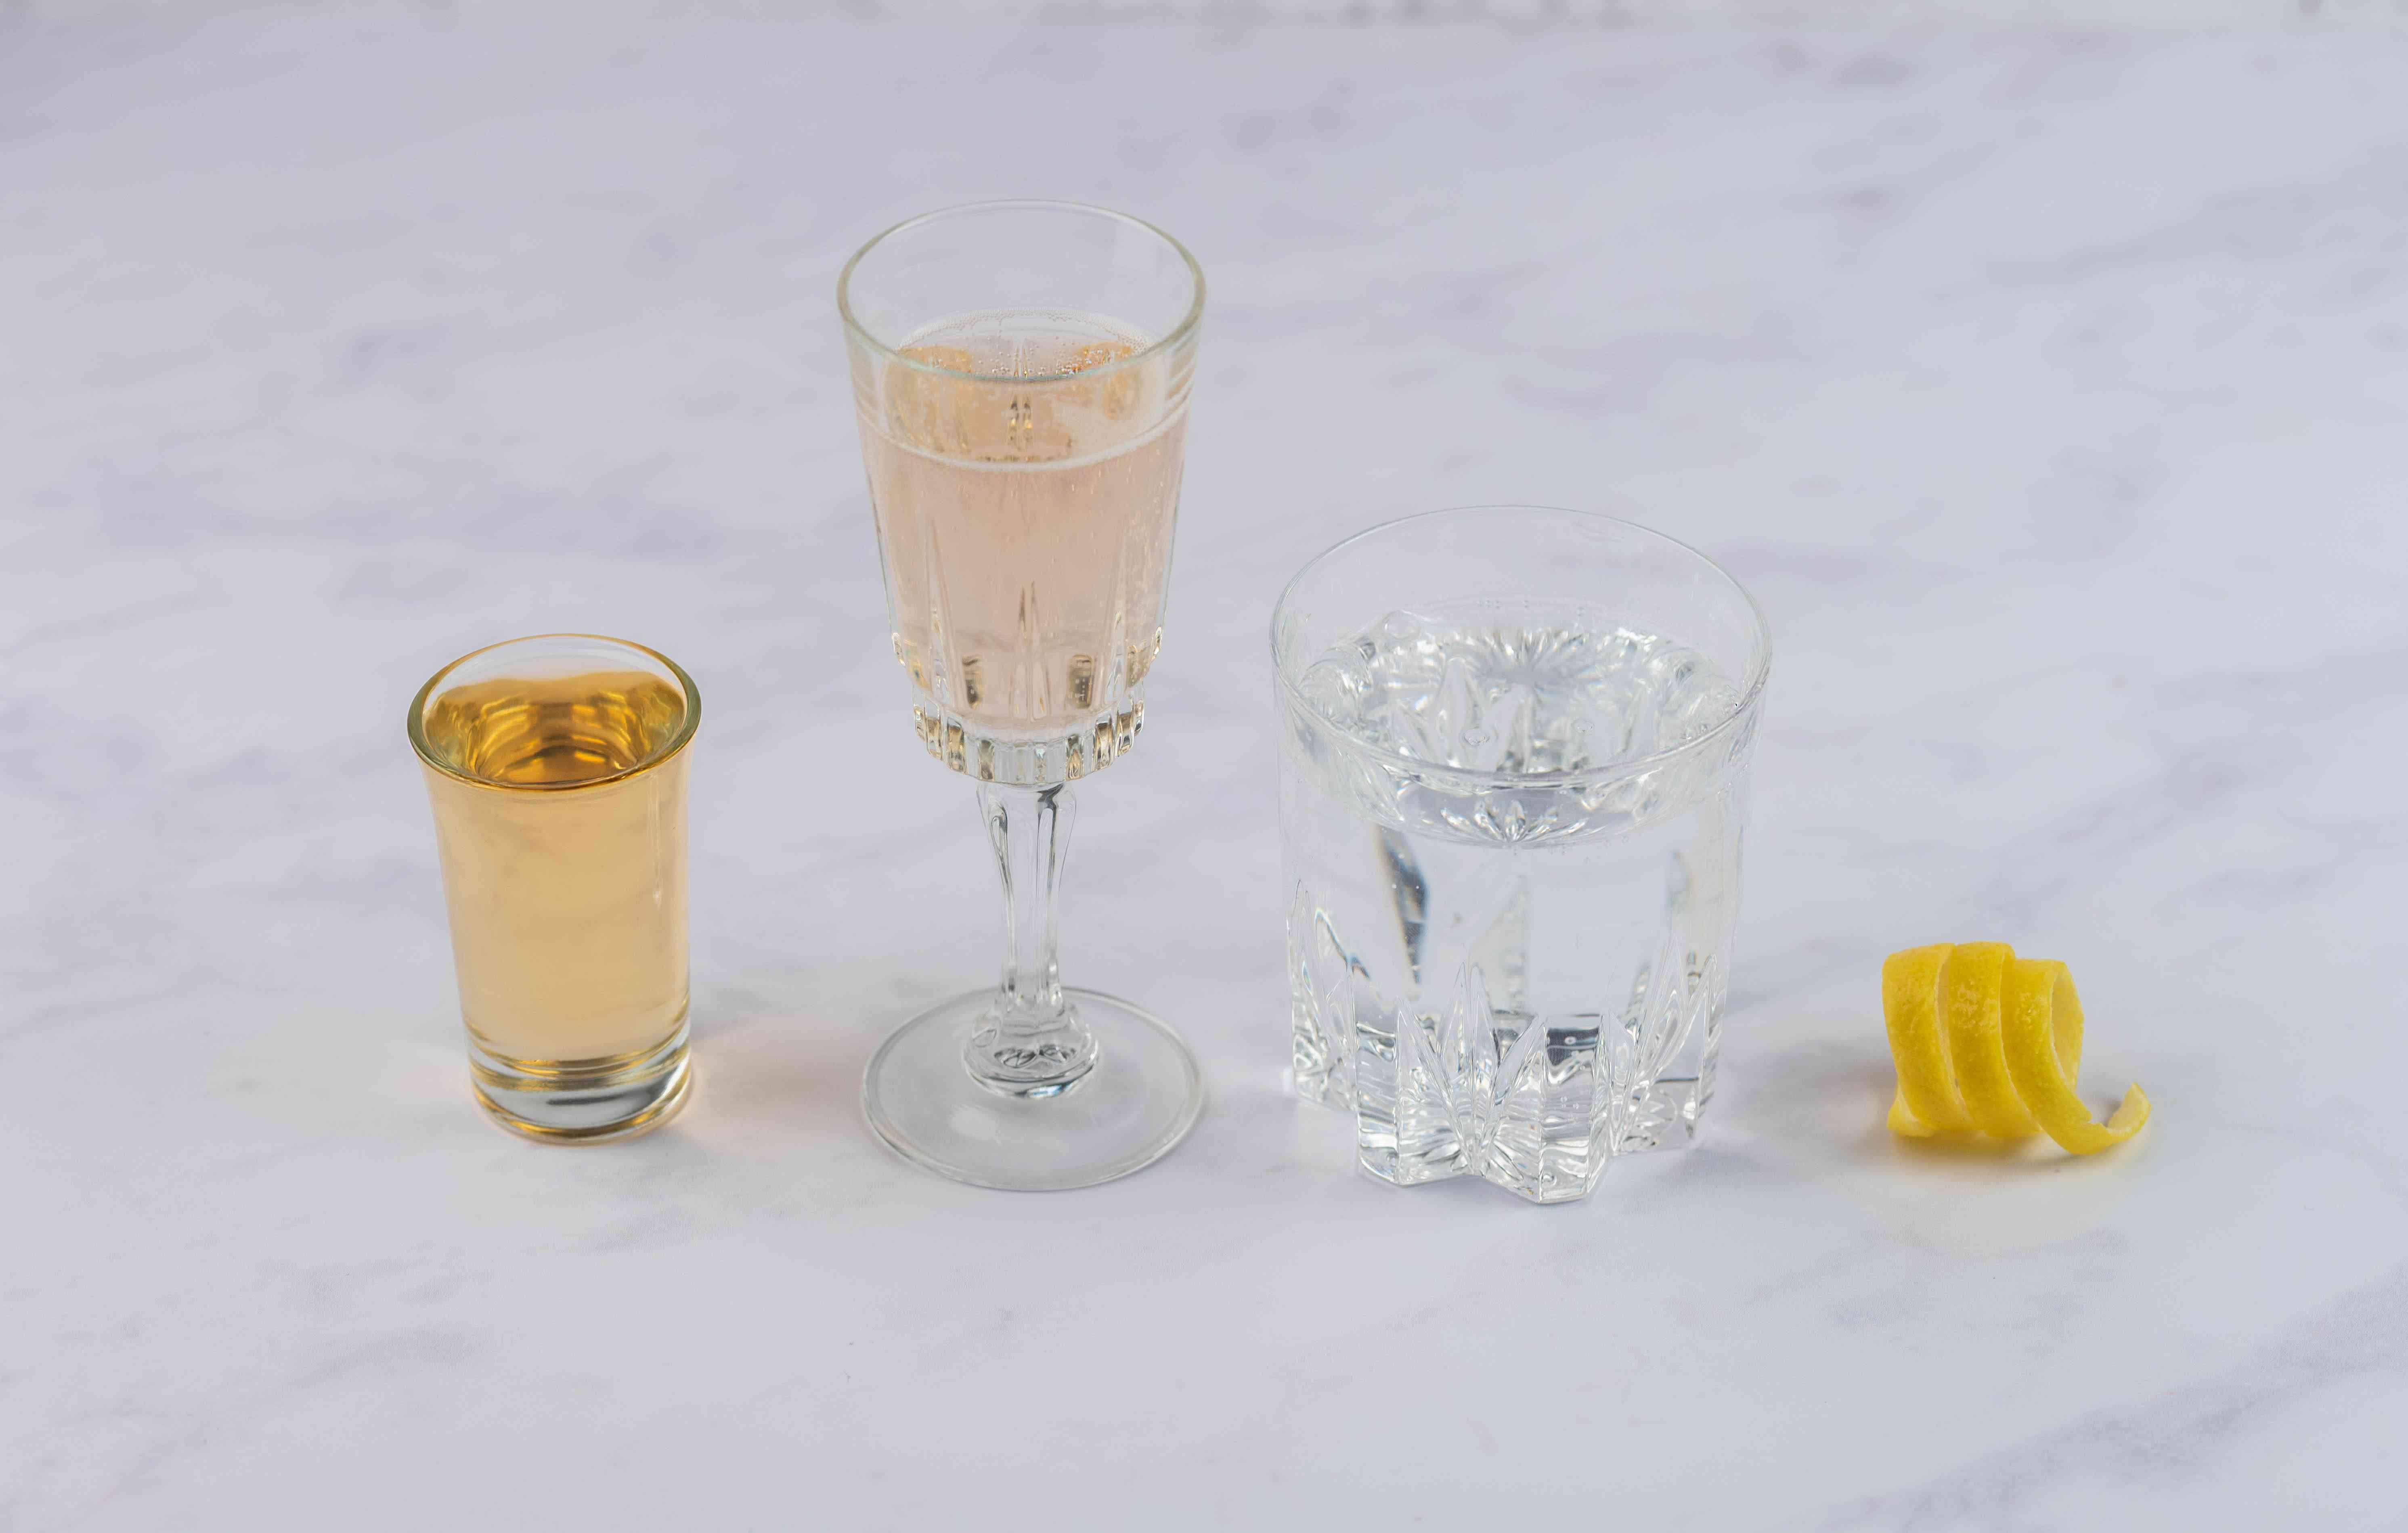 Elderflower Cocktail Recipe With Champagne ingredients